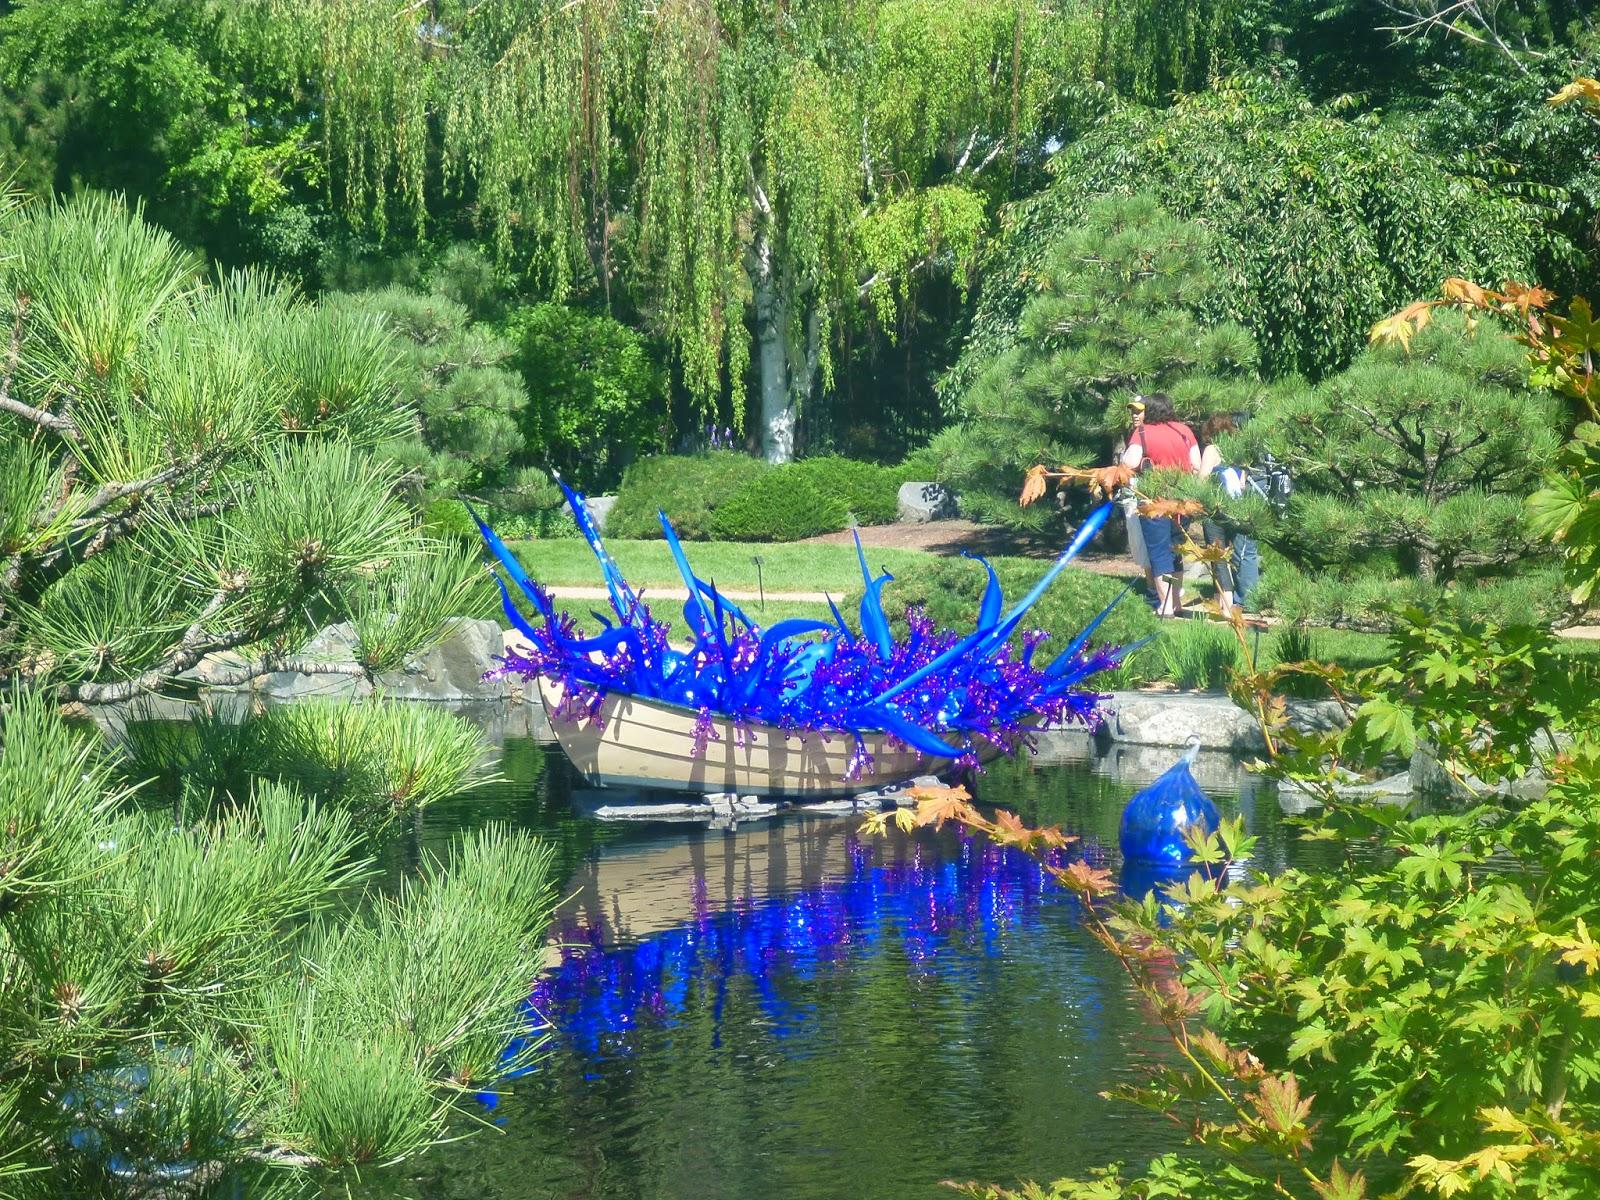 Artistic Journeys Chihuly Exhibit At The Denver Botanic Gardens